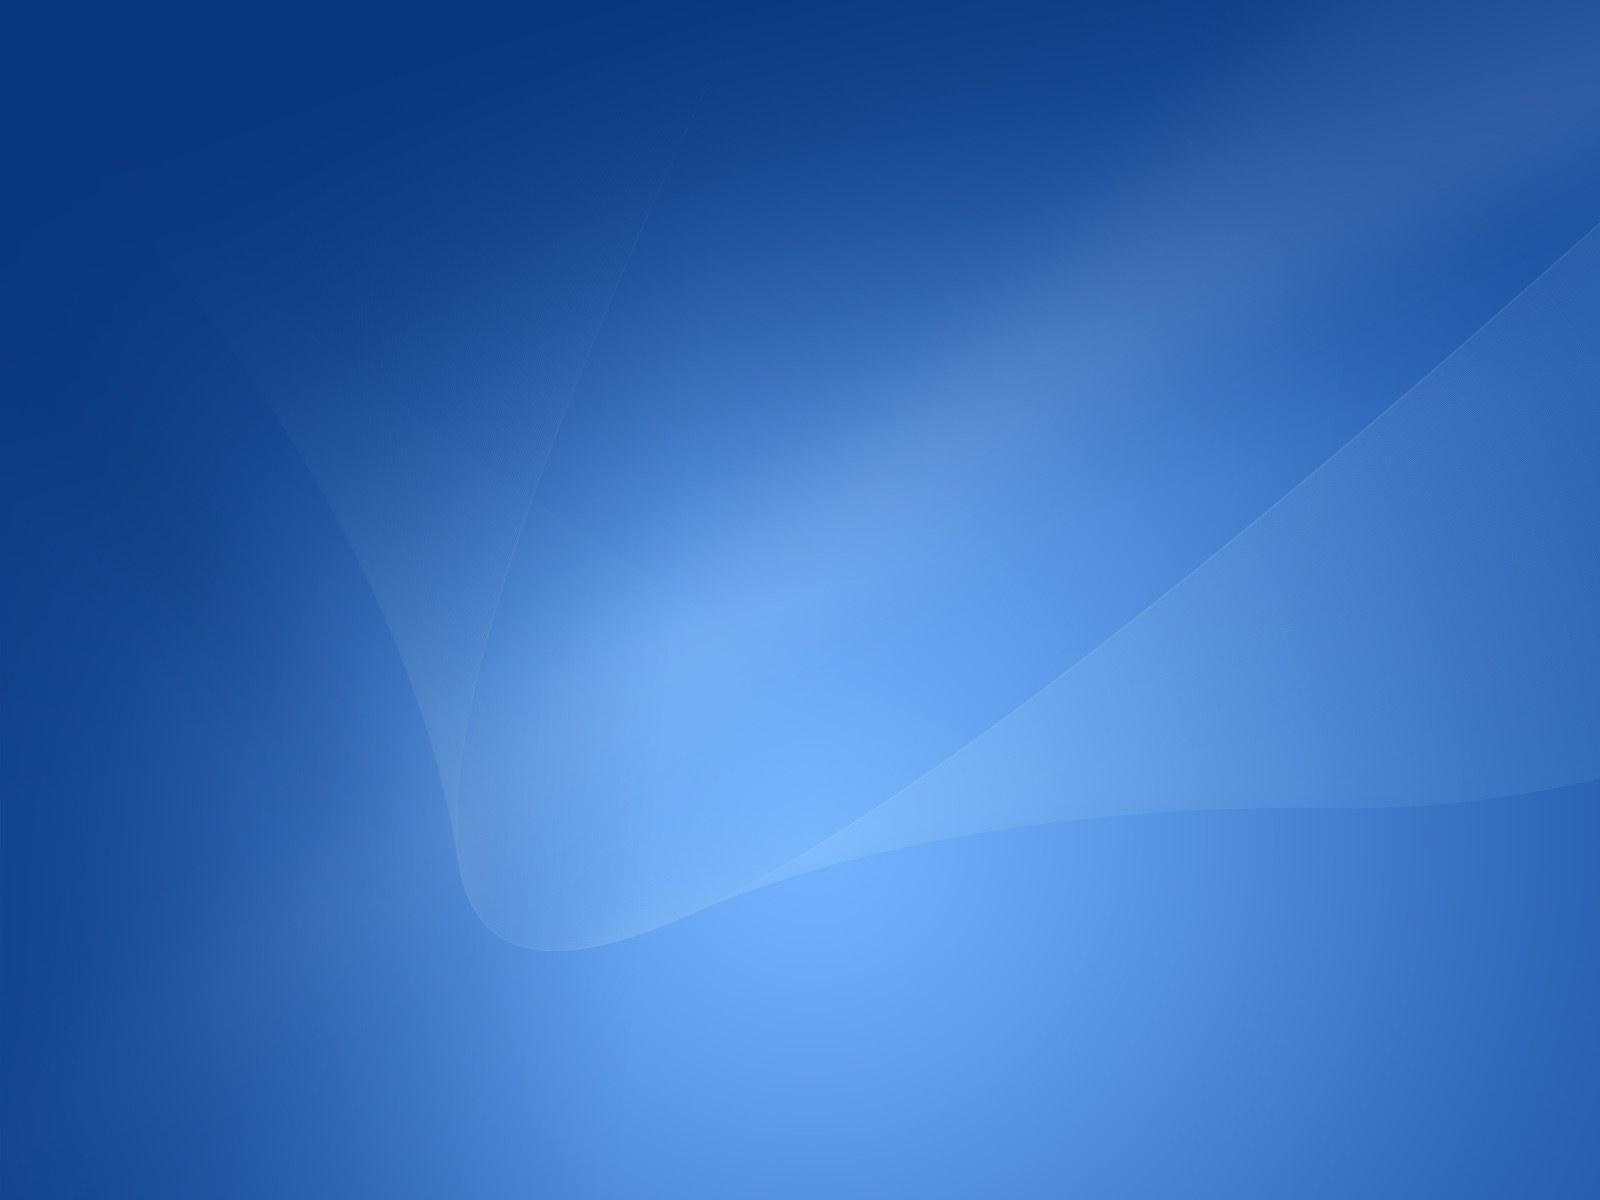 Mac OS X Wallpaper   HD Wallpaper 1600x1200